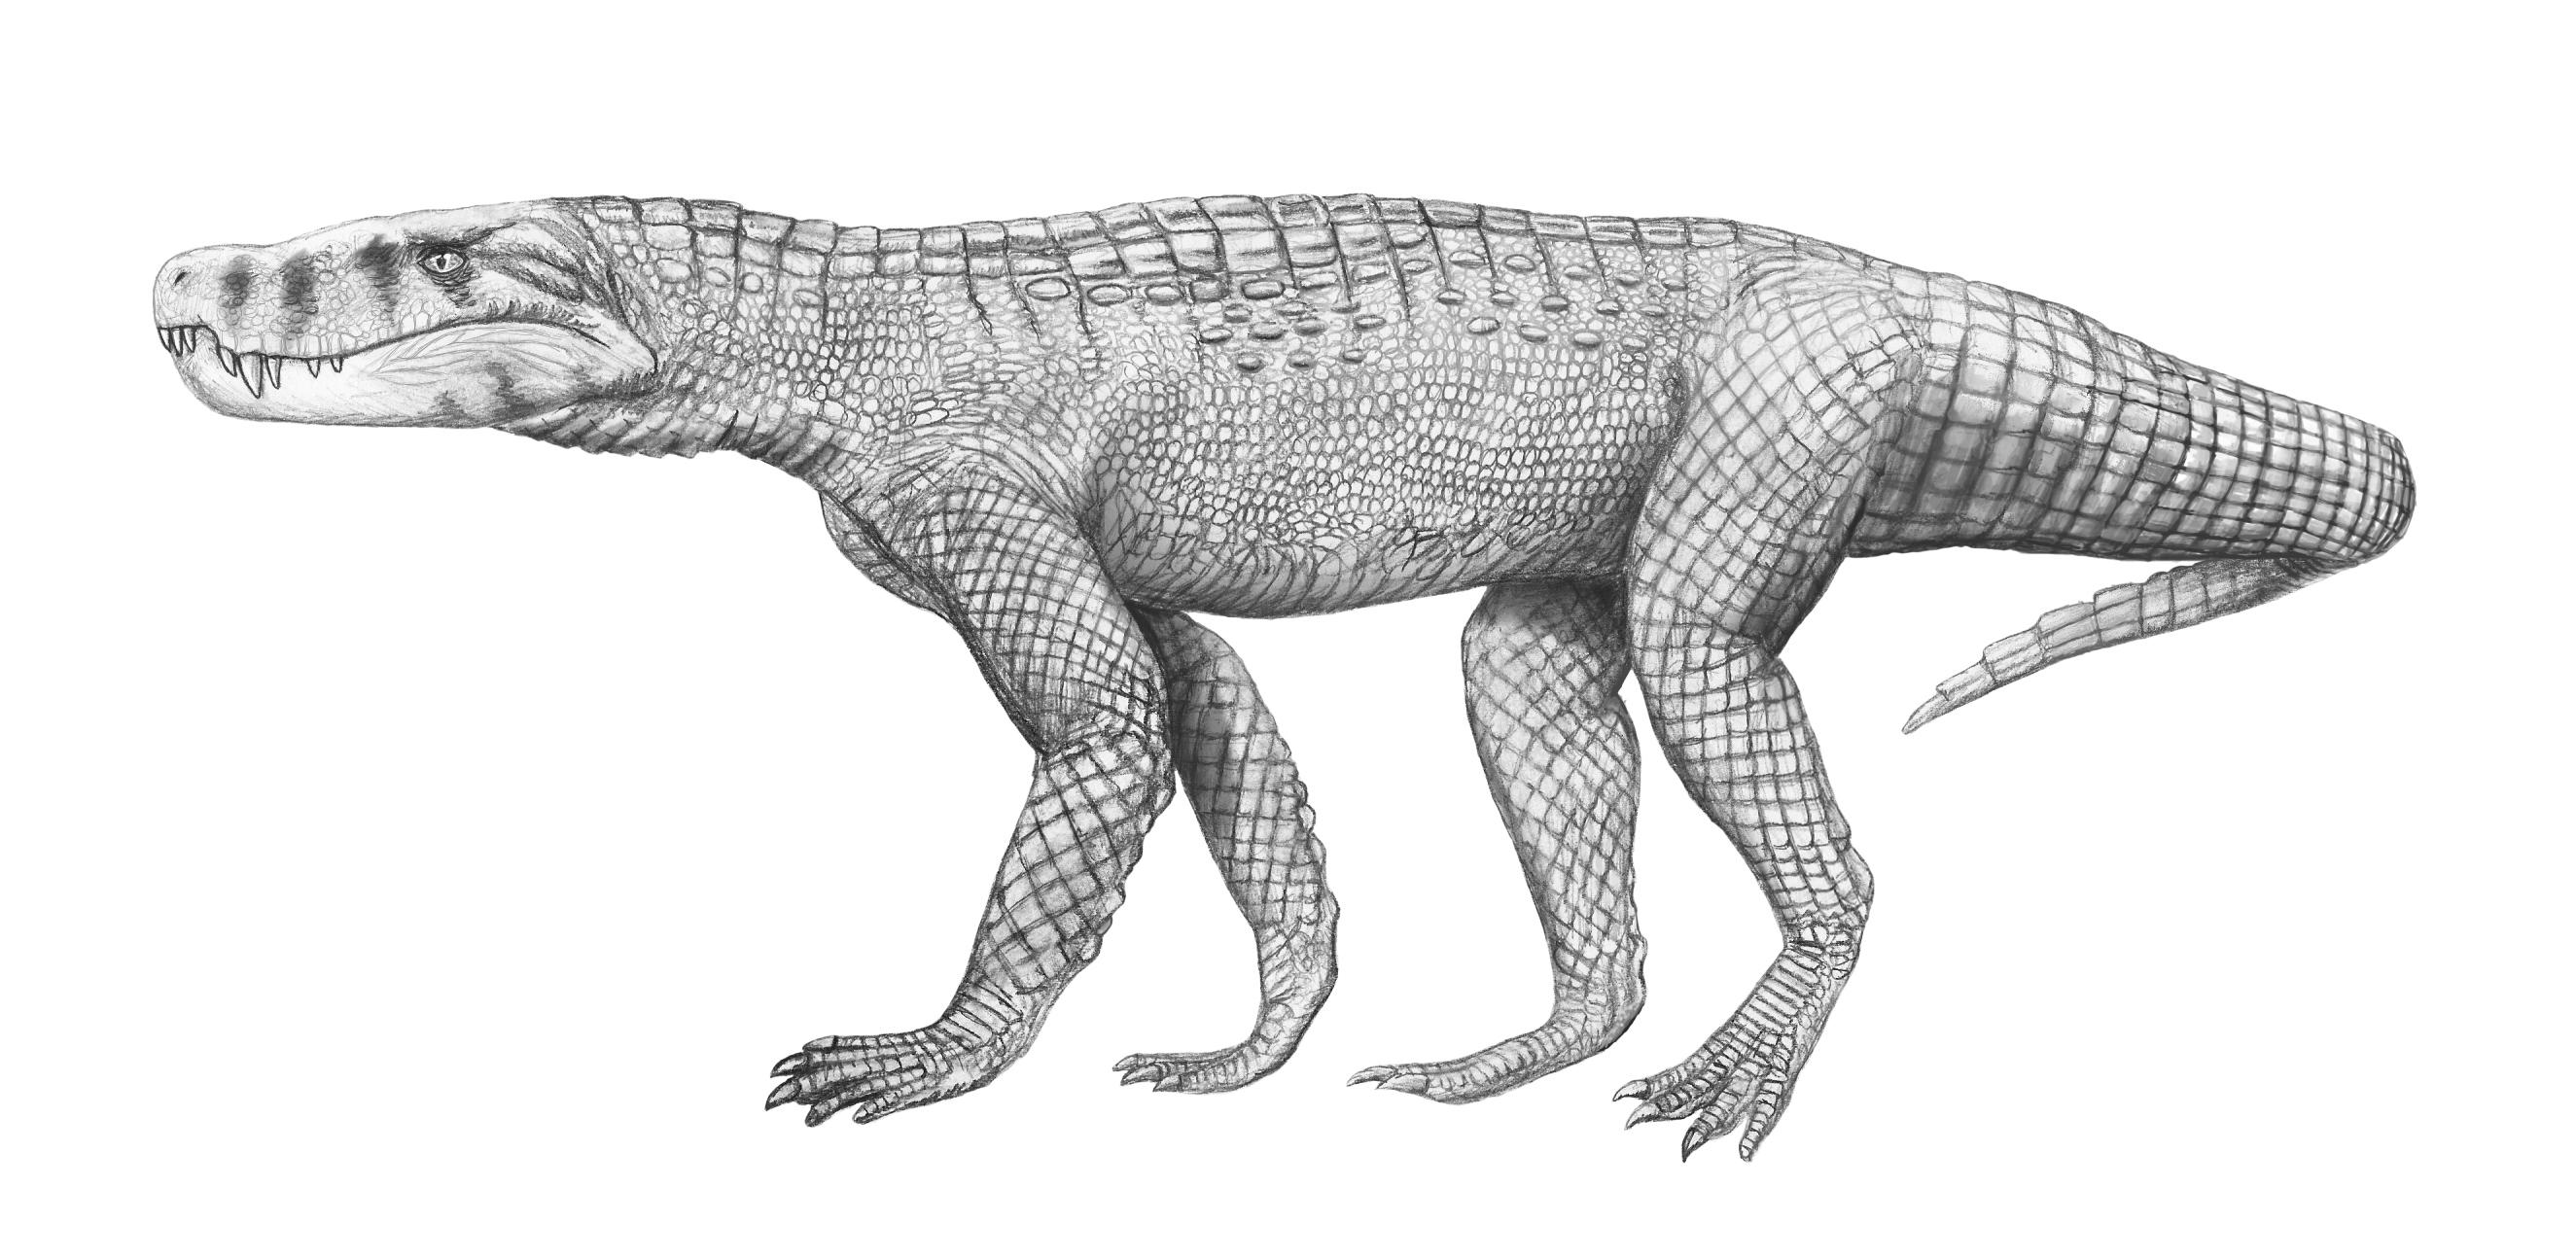 Baurusuchus